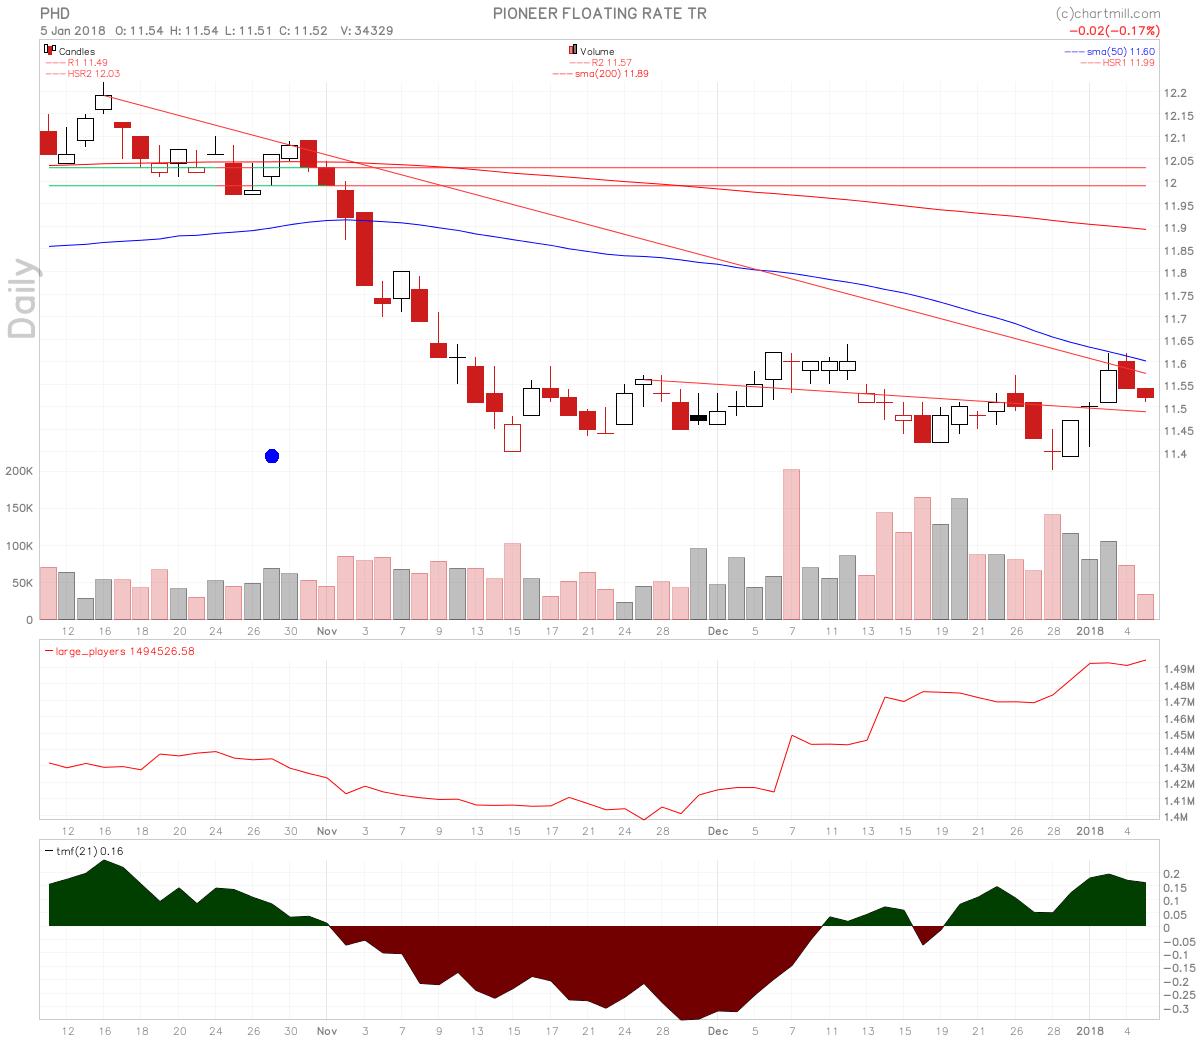 Pioneer Floating Rate Trust stock